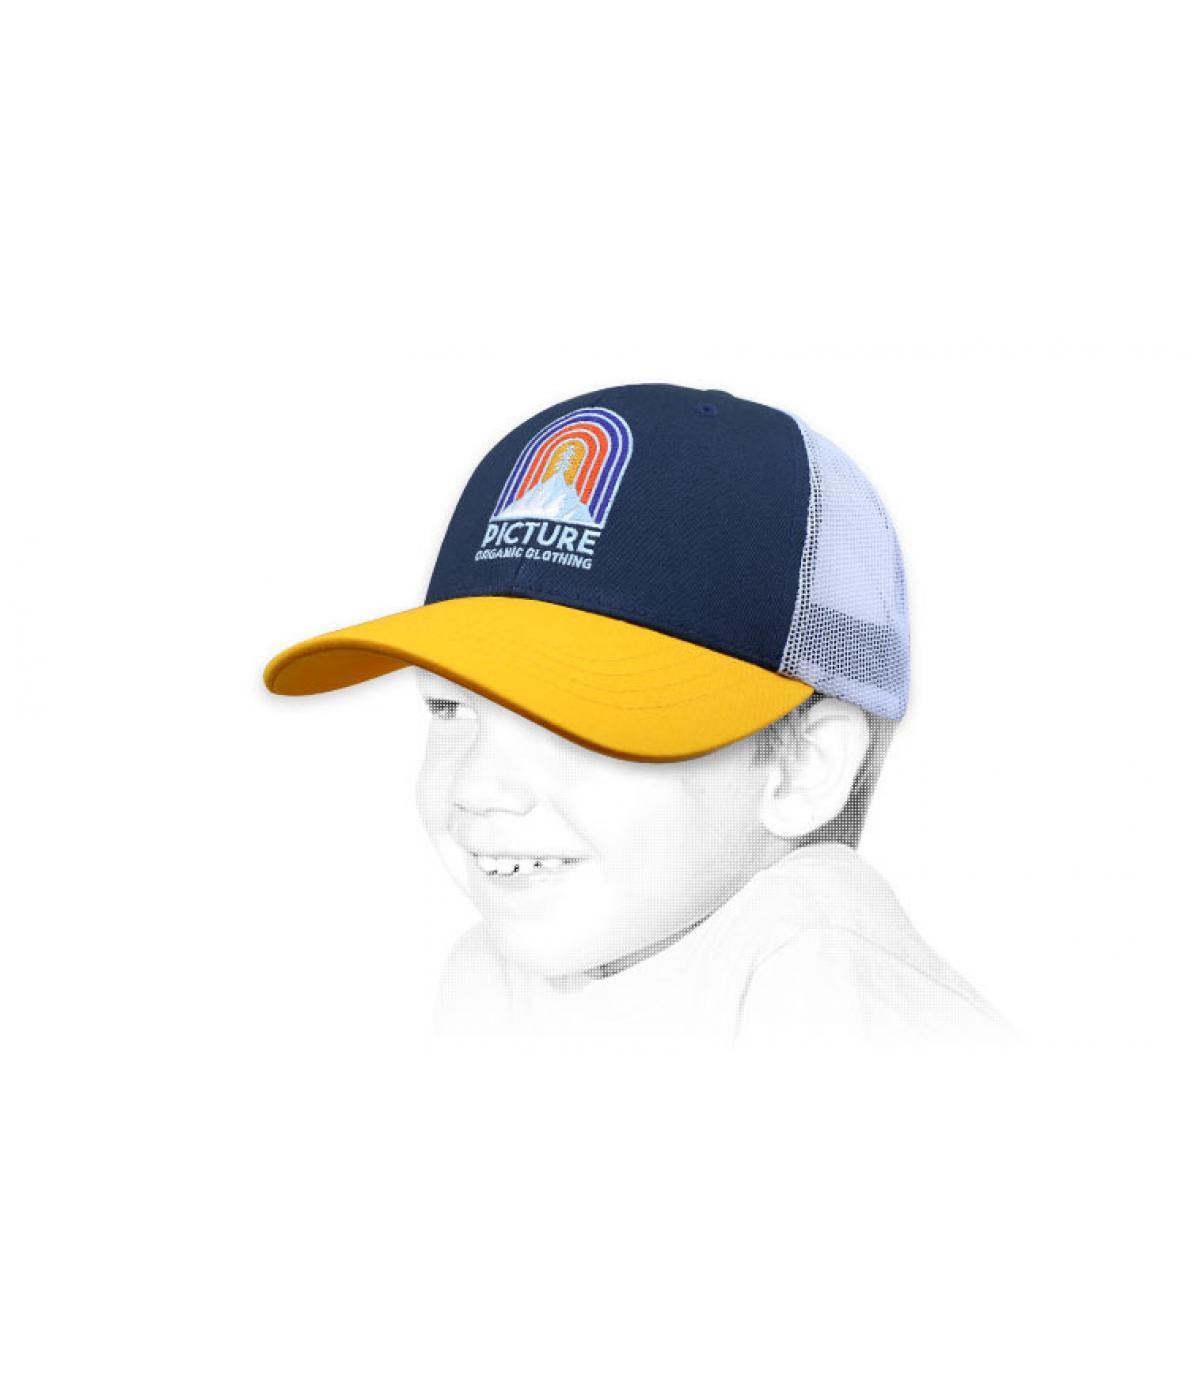 Picture trucker bambino giallo